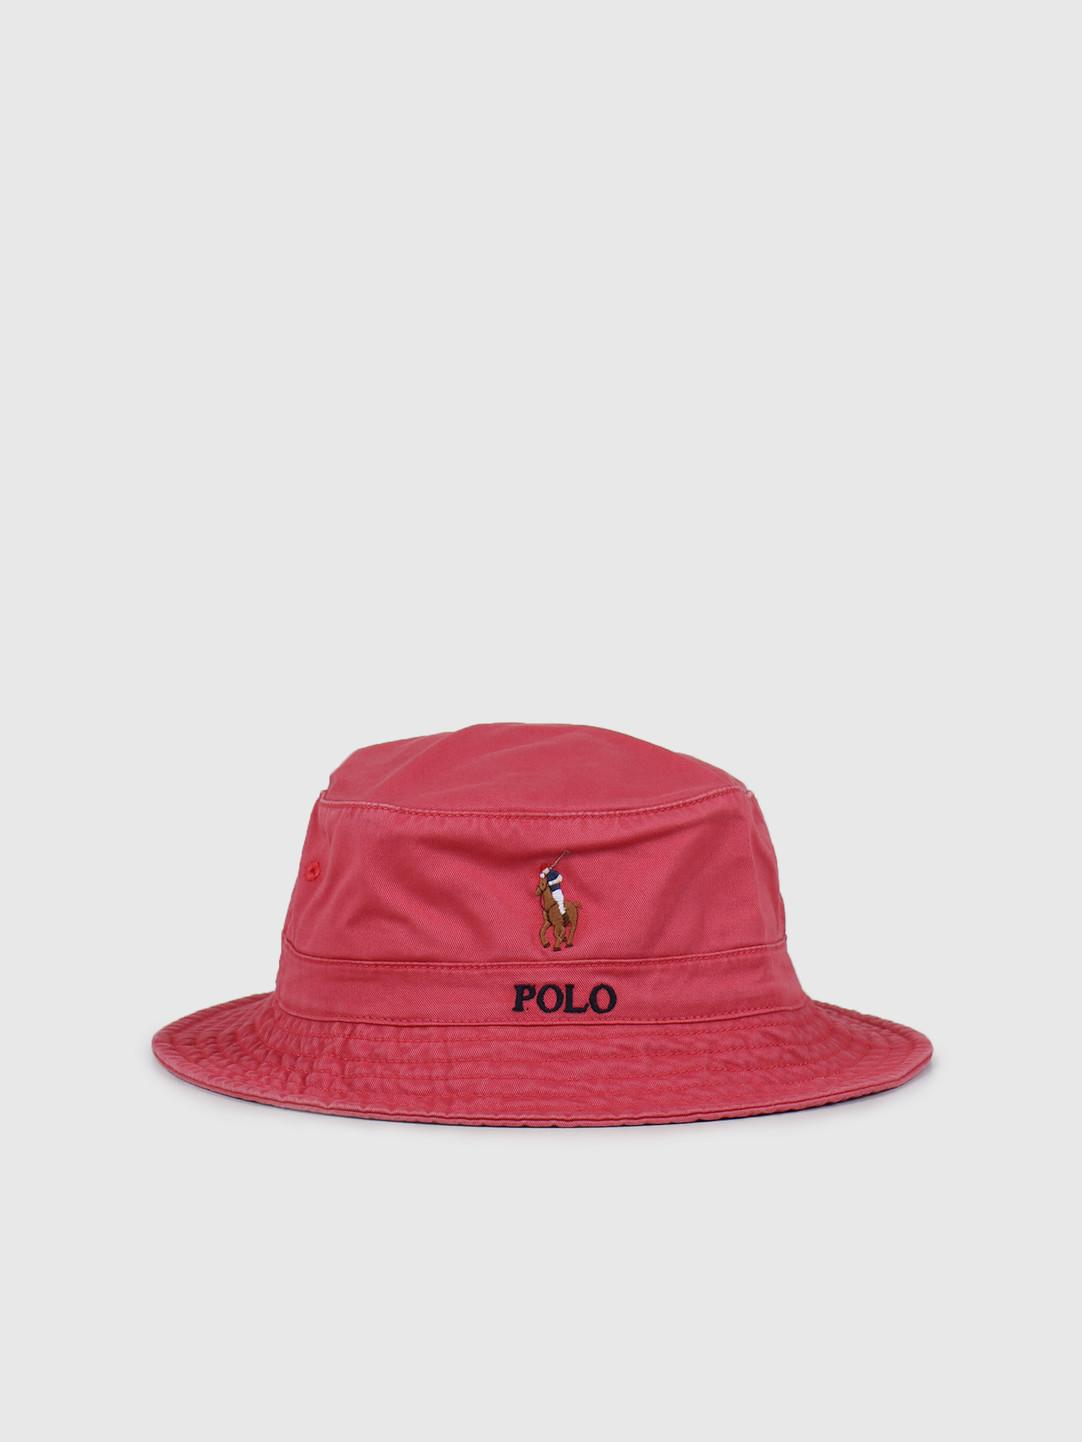 Polo Ralph Lauren Polo Ralph Lauren Loft Bucket Cap Multi PP Nantucket Red 710787242002